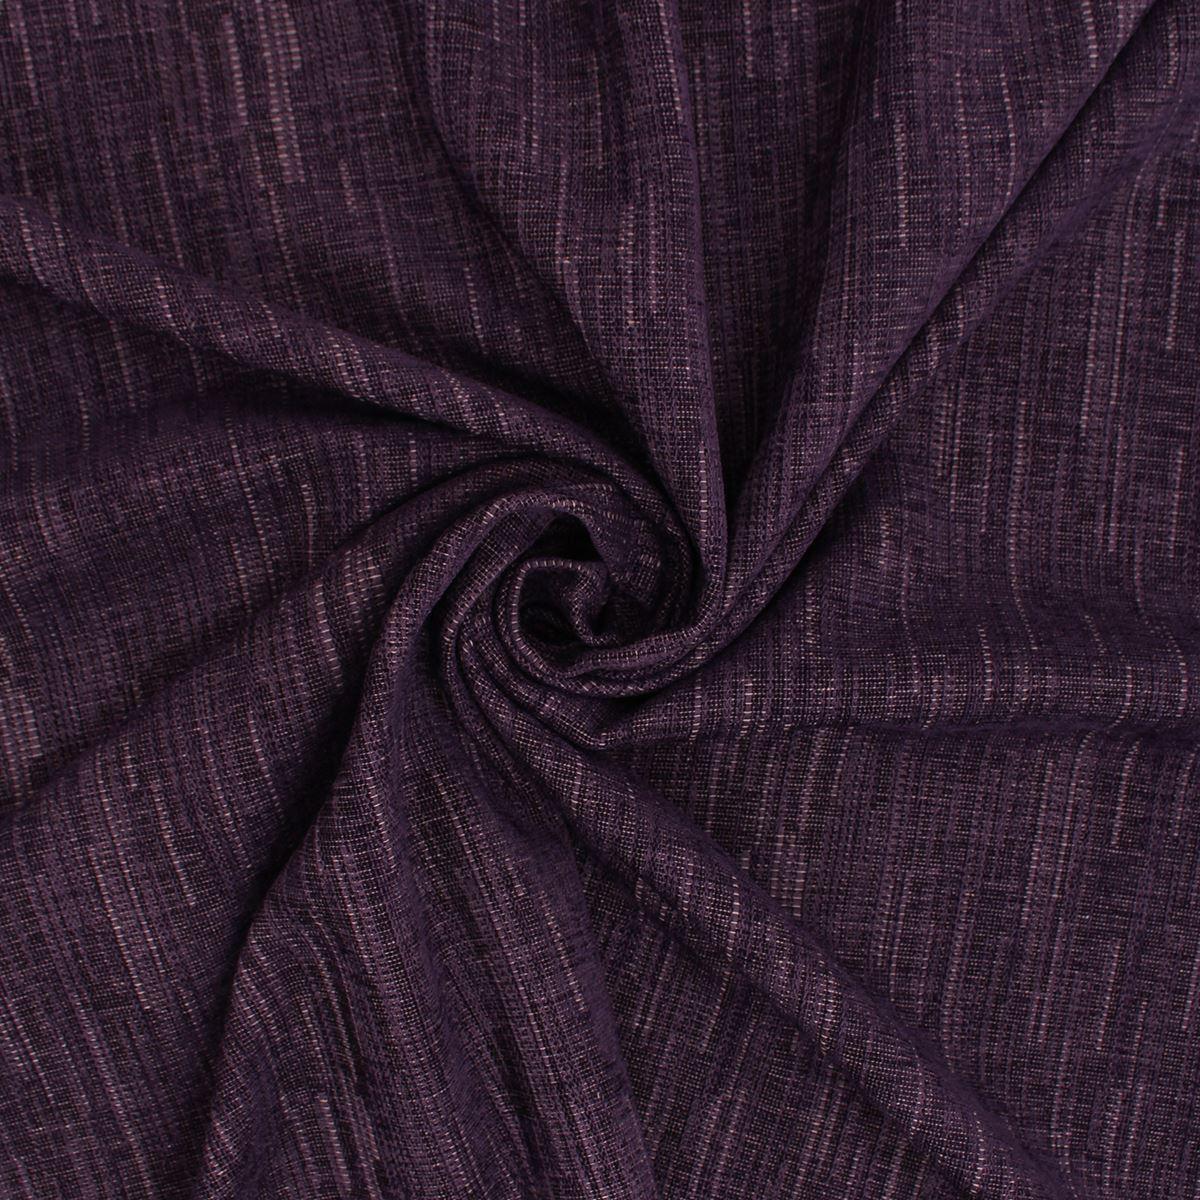 034-Chenille-034-Slubbed-Shabby-Worn-Look-Curtain-Cushion-Sofa-Upholstery-Fabric thumbnail 3